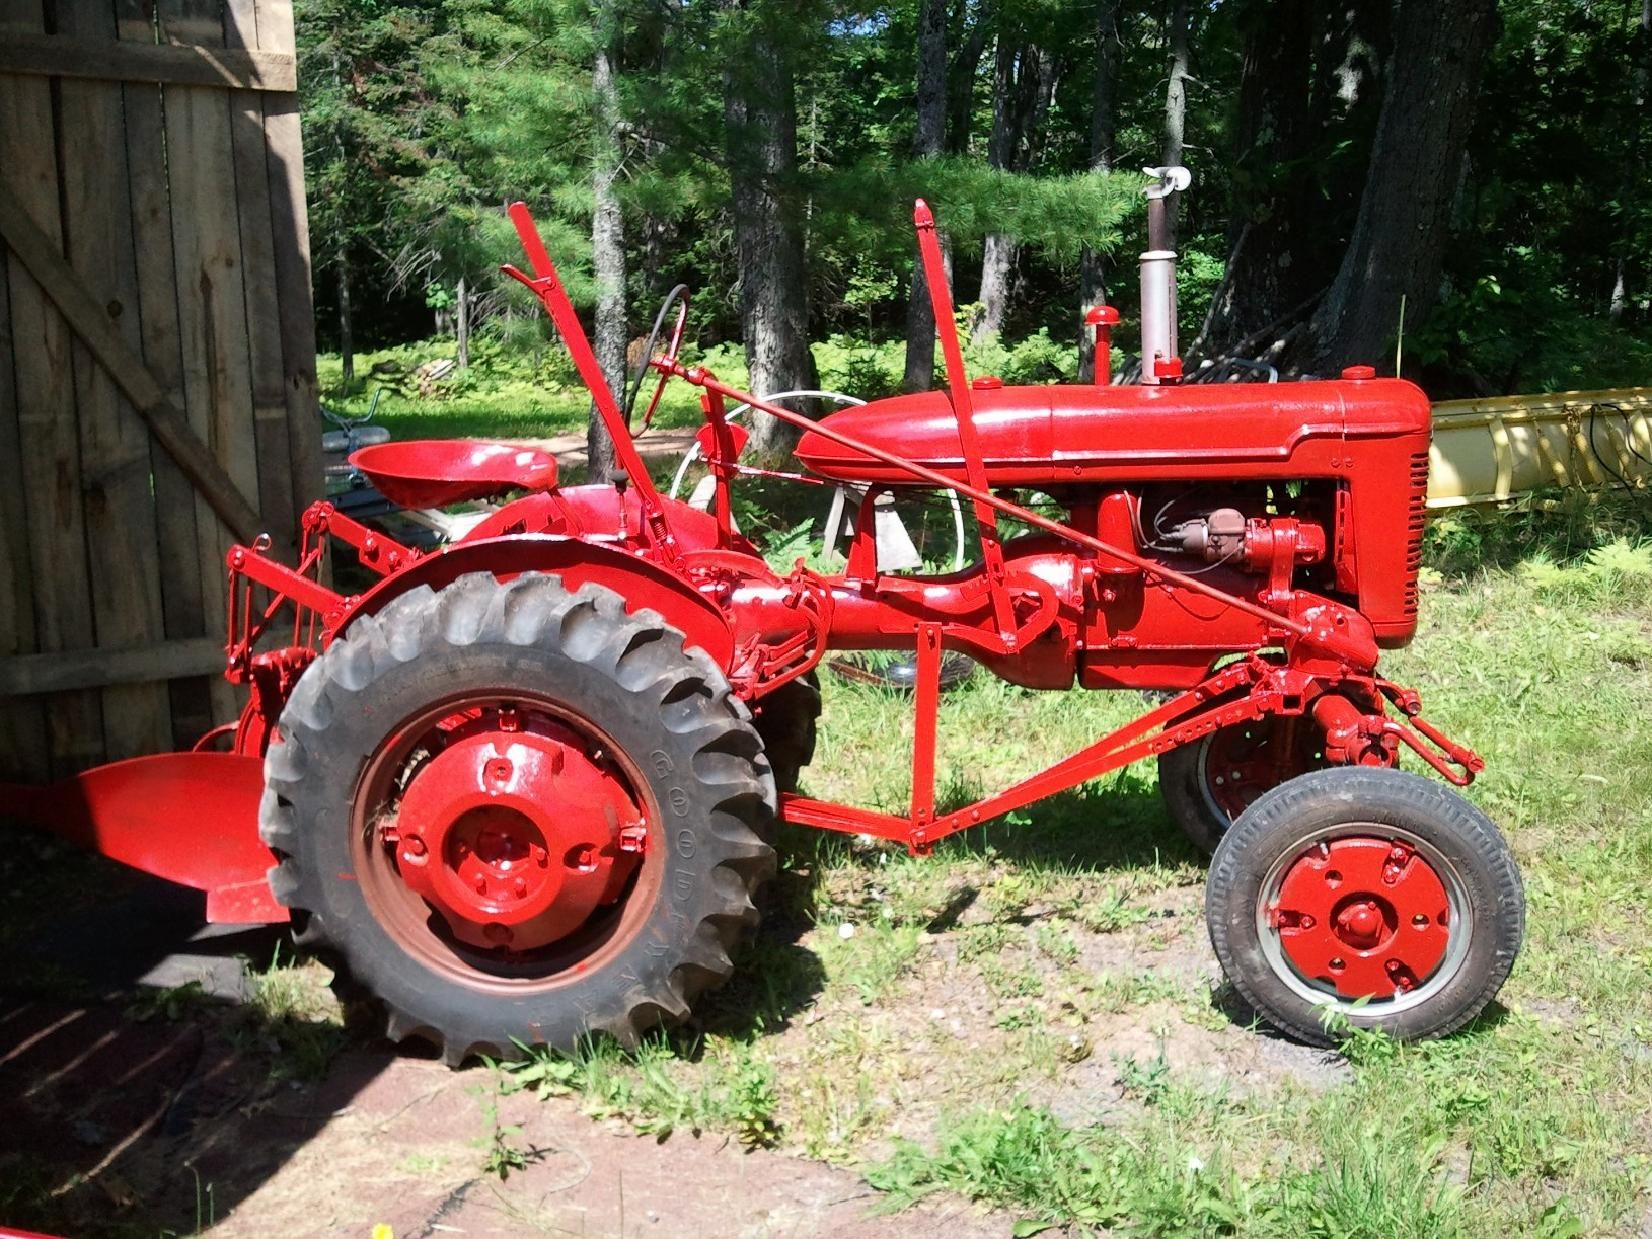 Ih 966 Wiring Diagram 1206 Tractor 706 Farmall Jd 2020 4020